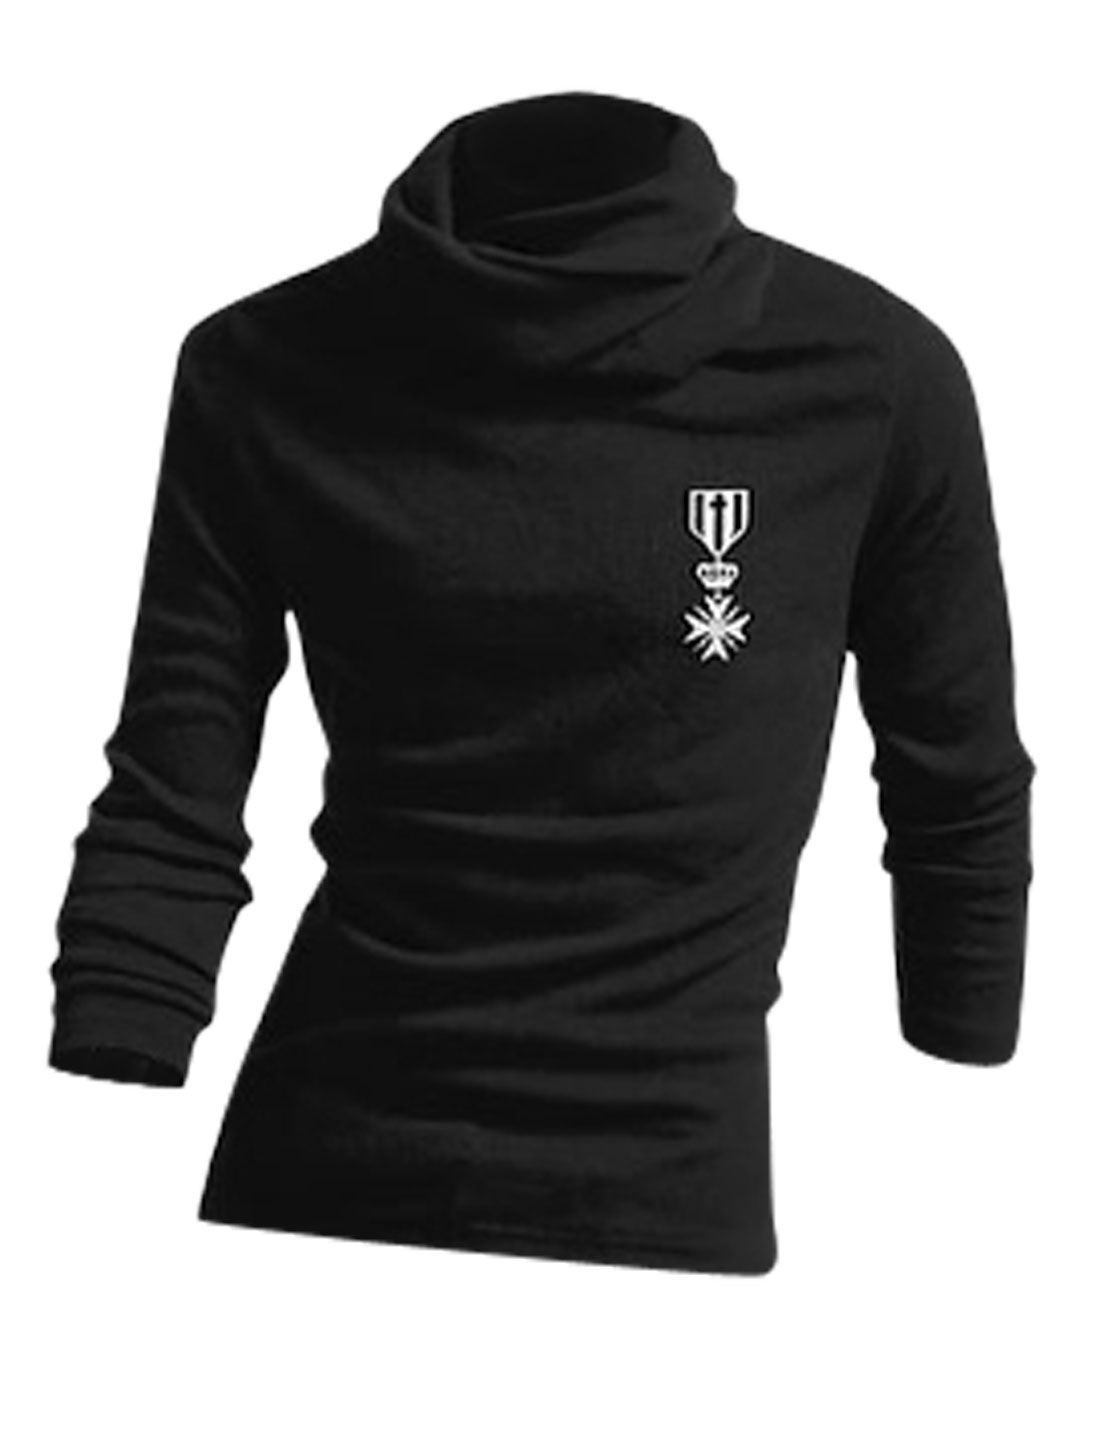 Men Cowl Neck Medal Printed Pullover Casual Top Shirt Black M